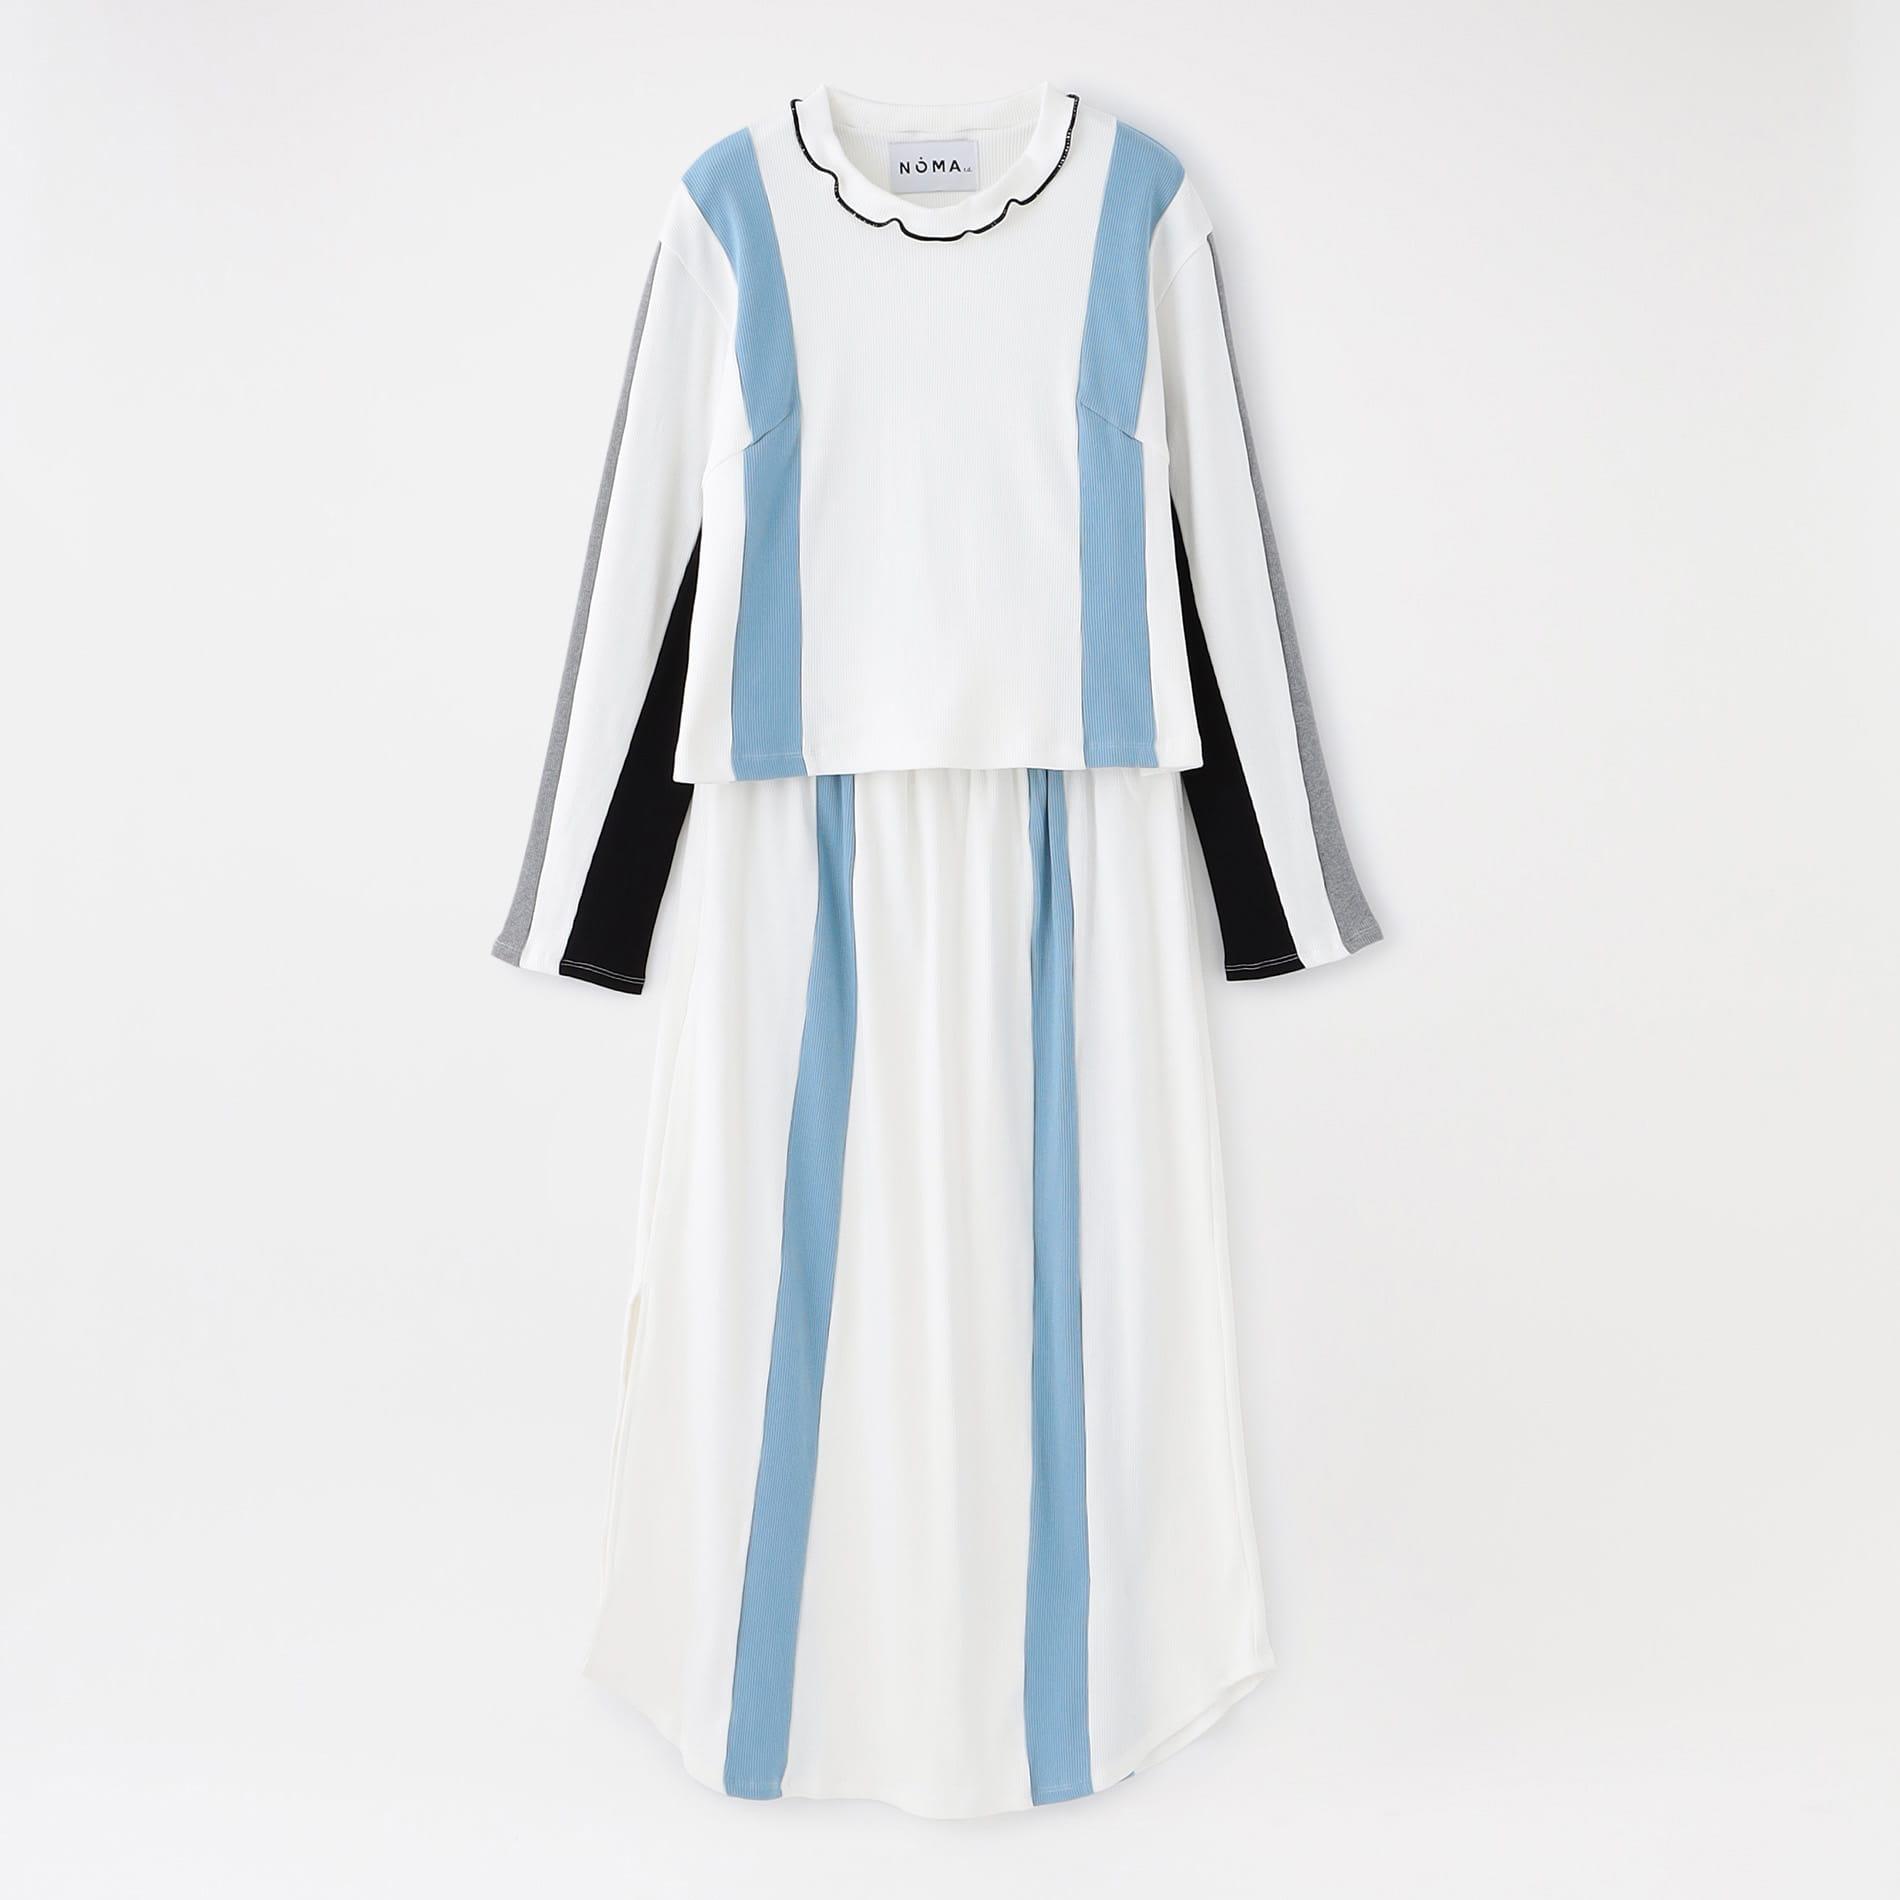 【NOMA t.d.】WOMEN トップス&スカート Color Block Ribbed Top & Skirt SE 01